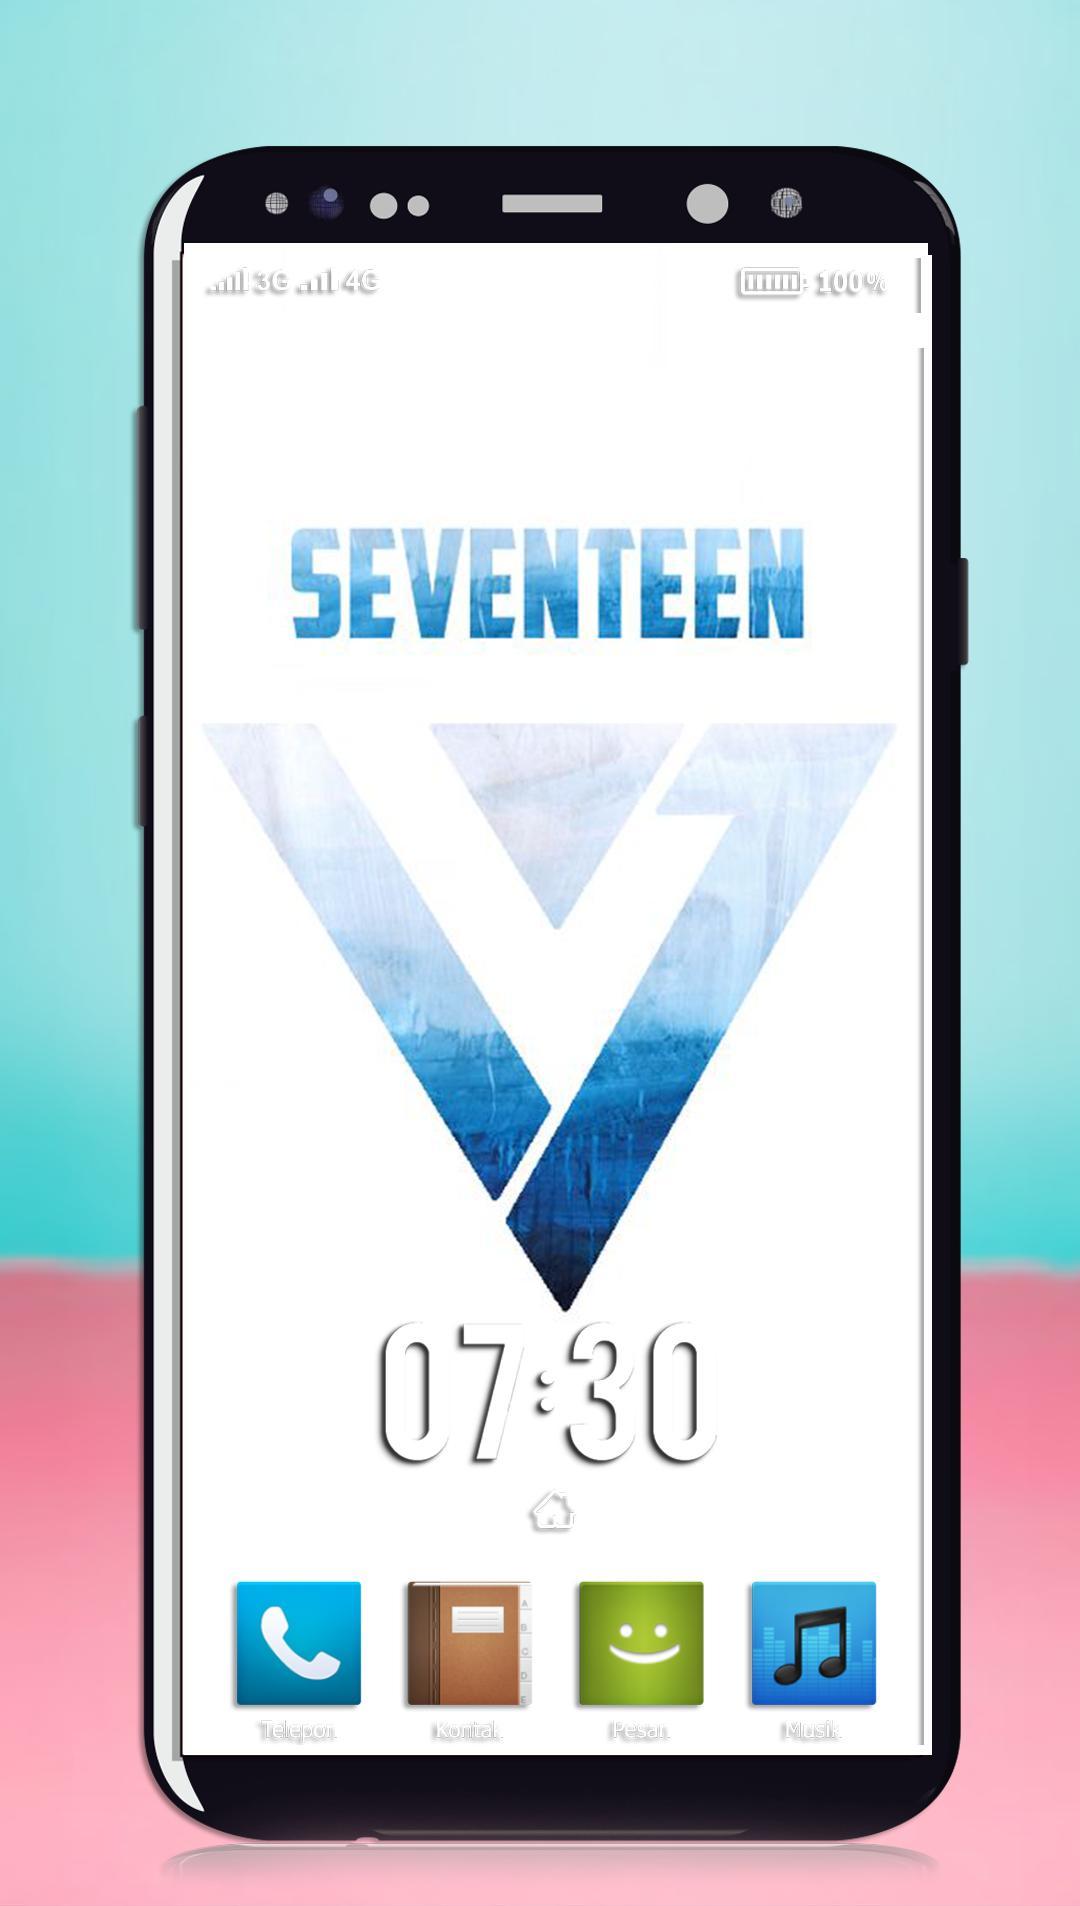 Seventeen Kpop Wallpaper For Android Apk Download